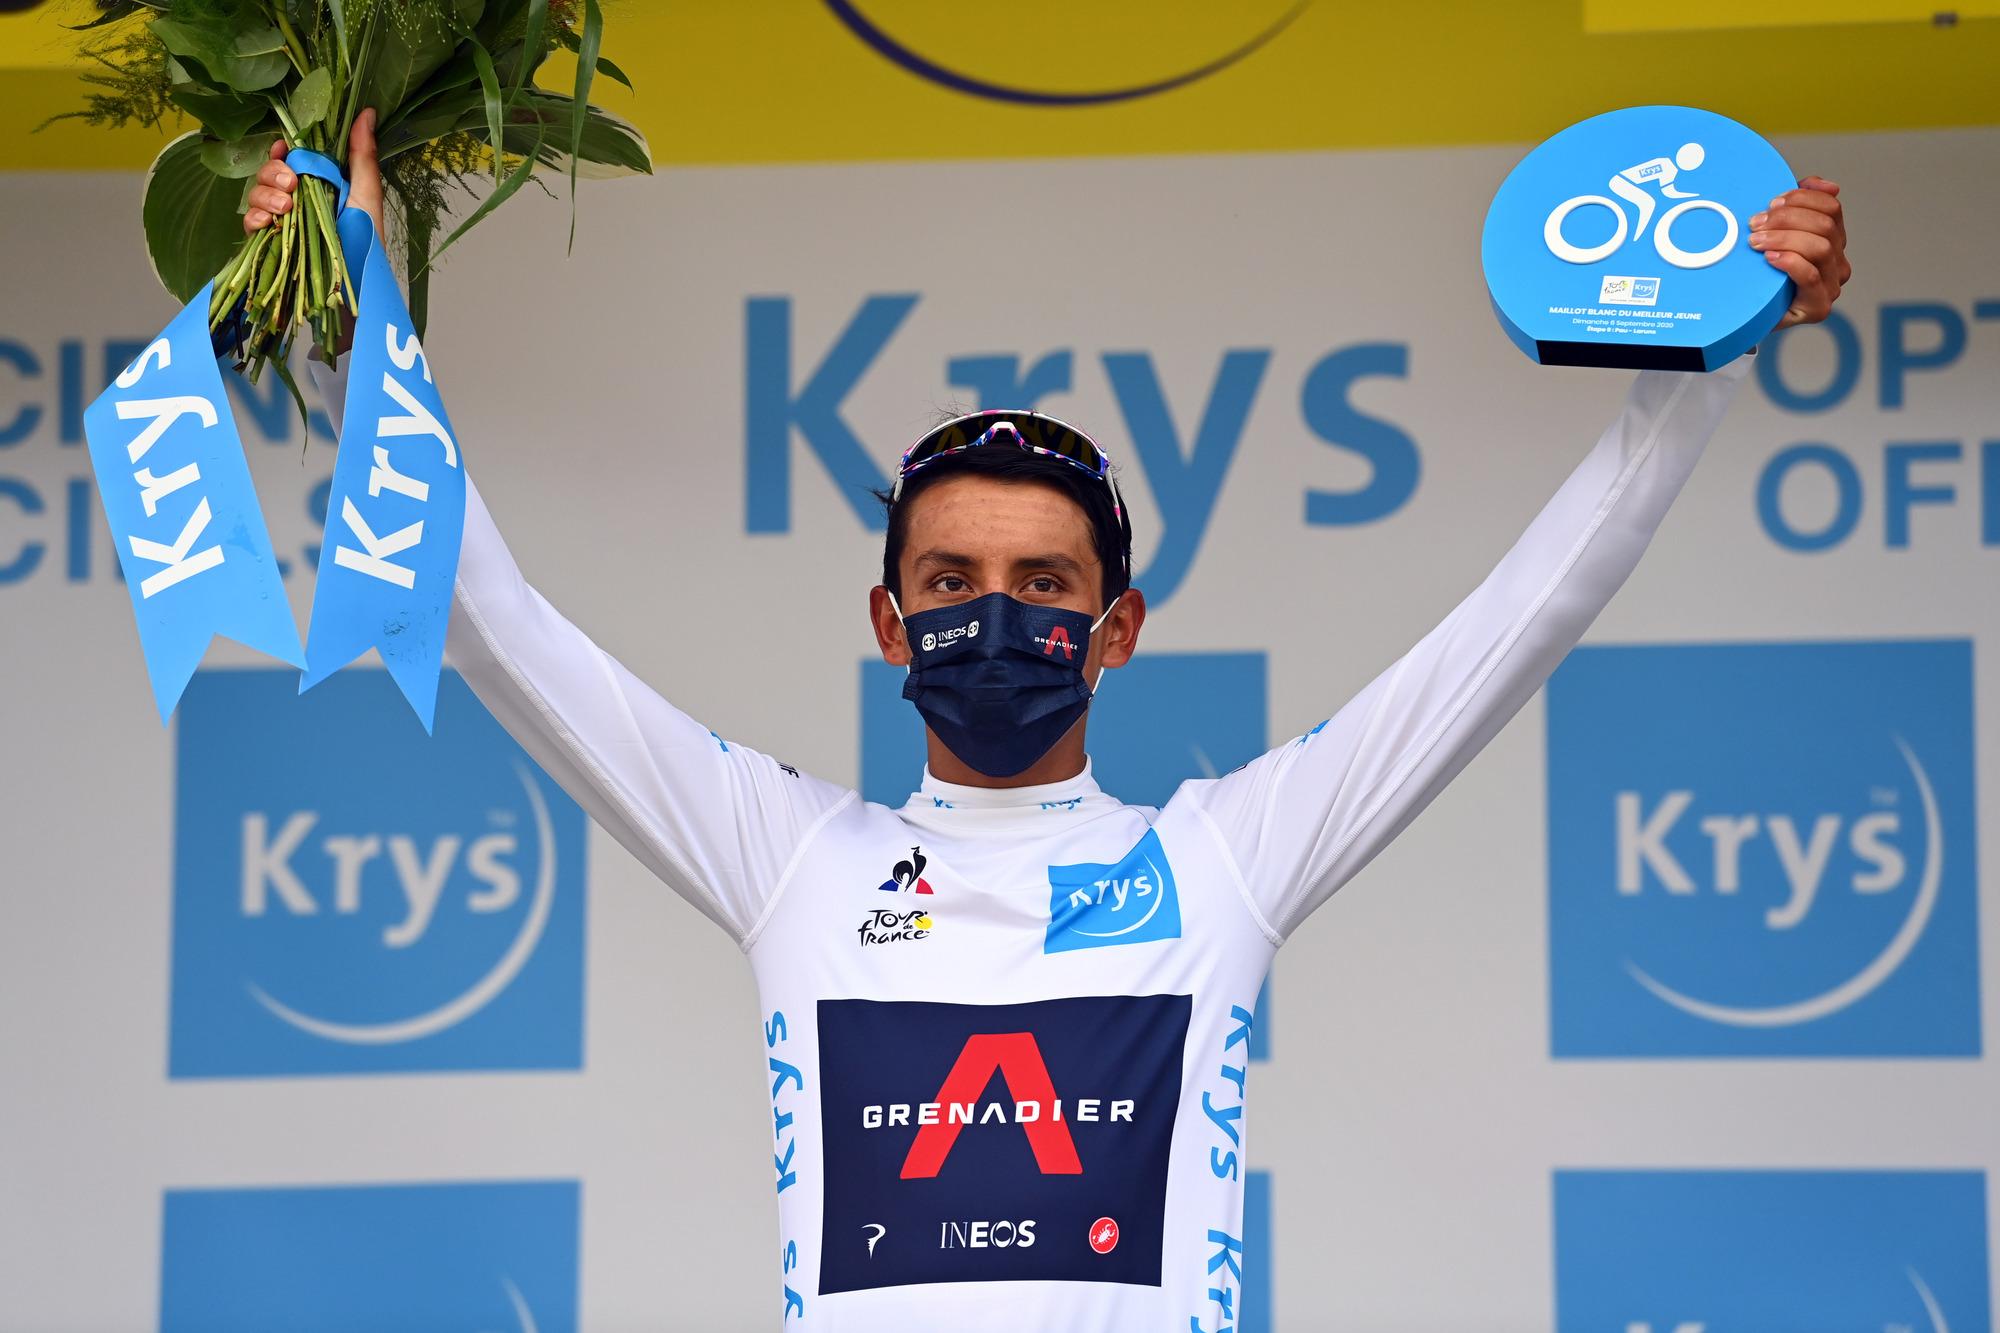 Tour de France 2020 - 107th Edition - 9th stage Pau - Laruns 153 km - 05/09/2020 - Egan Bernal (COL - Team Ineos) - photo POOL/BettiniPhoto©2020